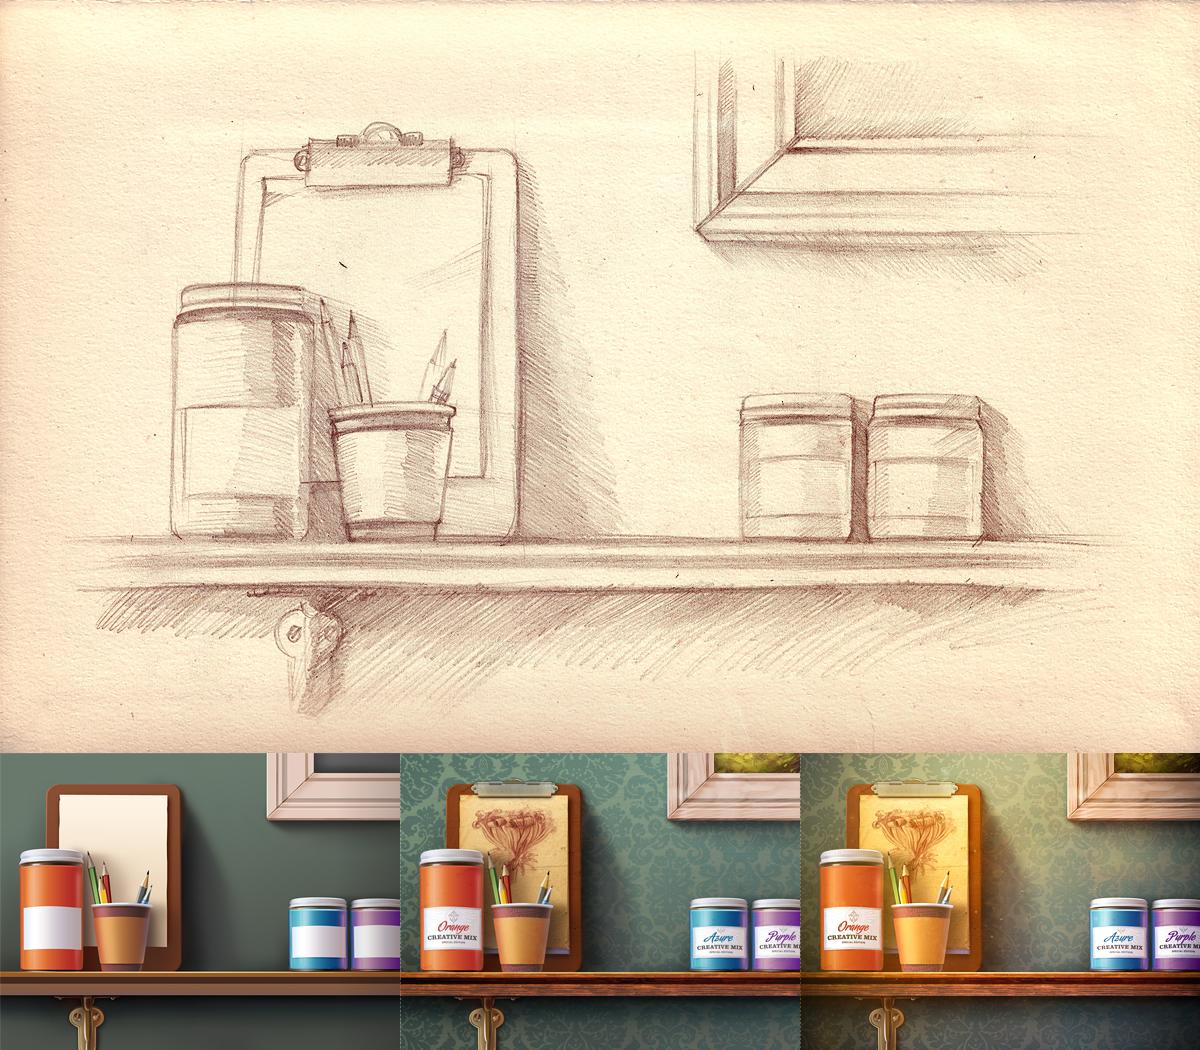 Shelf by Mike | Creative Mints